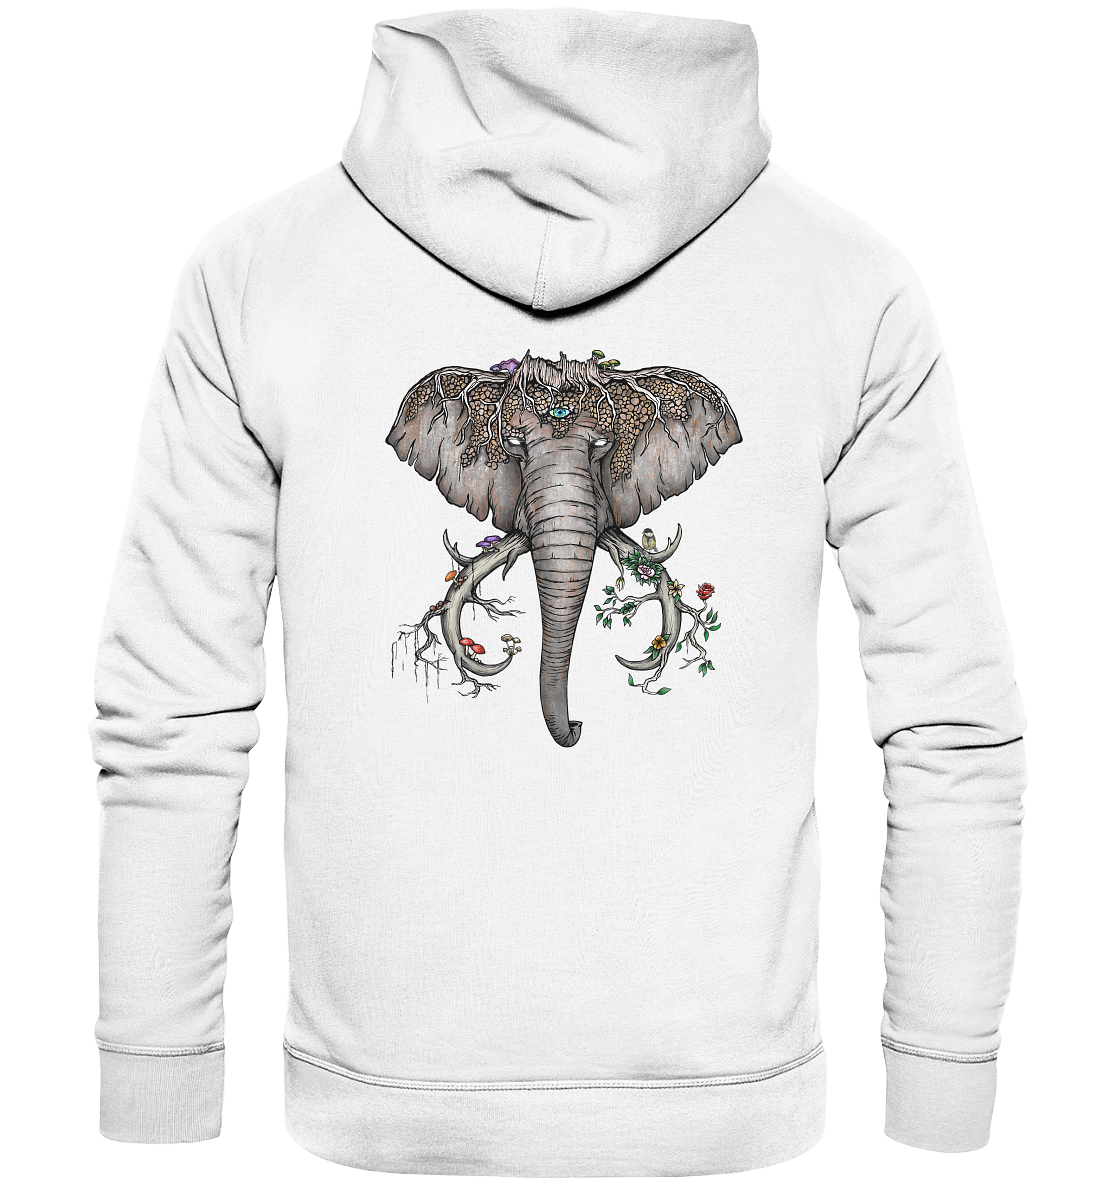 back-organic-fashion-hoodie-f8f8f8-1116x-1.png